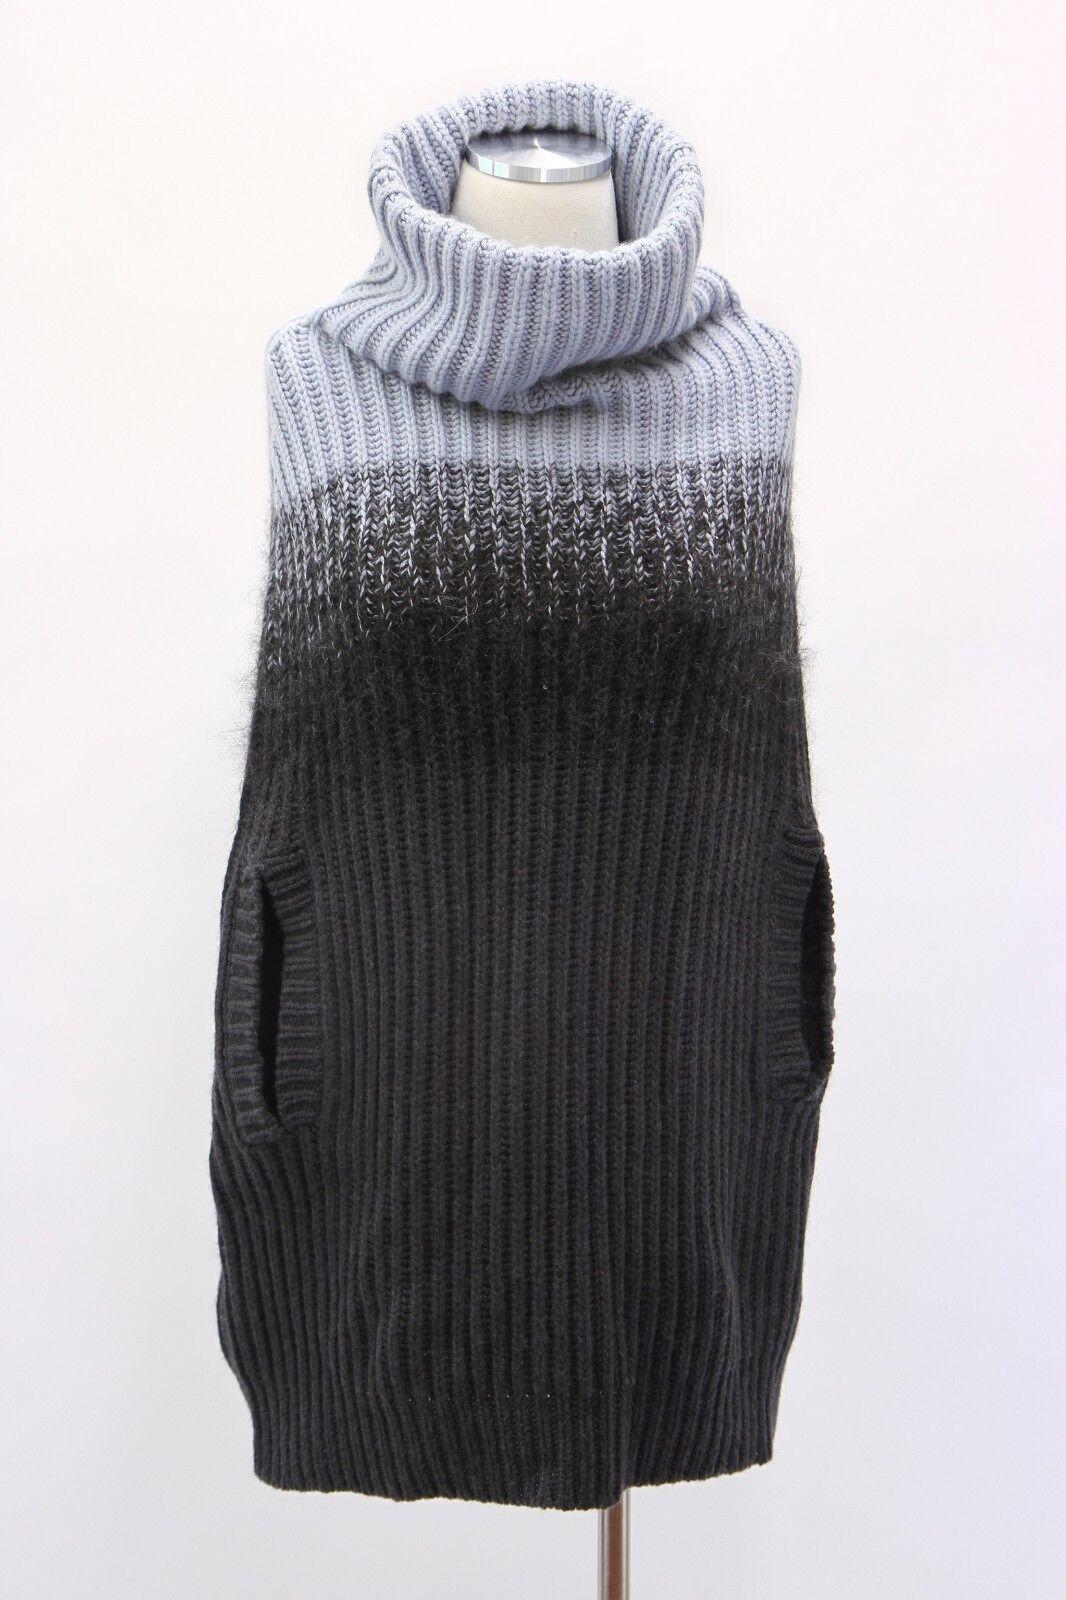 8f2a68bba33dca NWT 3495 Brunello Cucinelli 100% Ribbed Sequin Ombré Long Knit M A181  Cashmere npfvdm2285-neue Kleidung